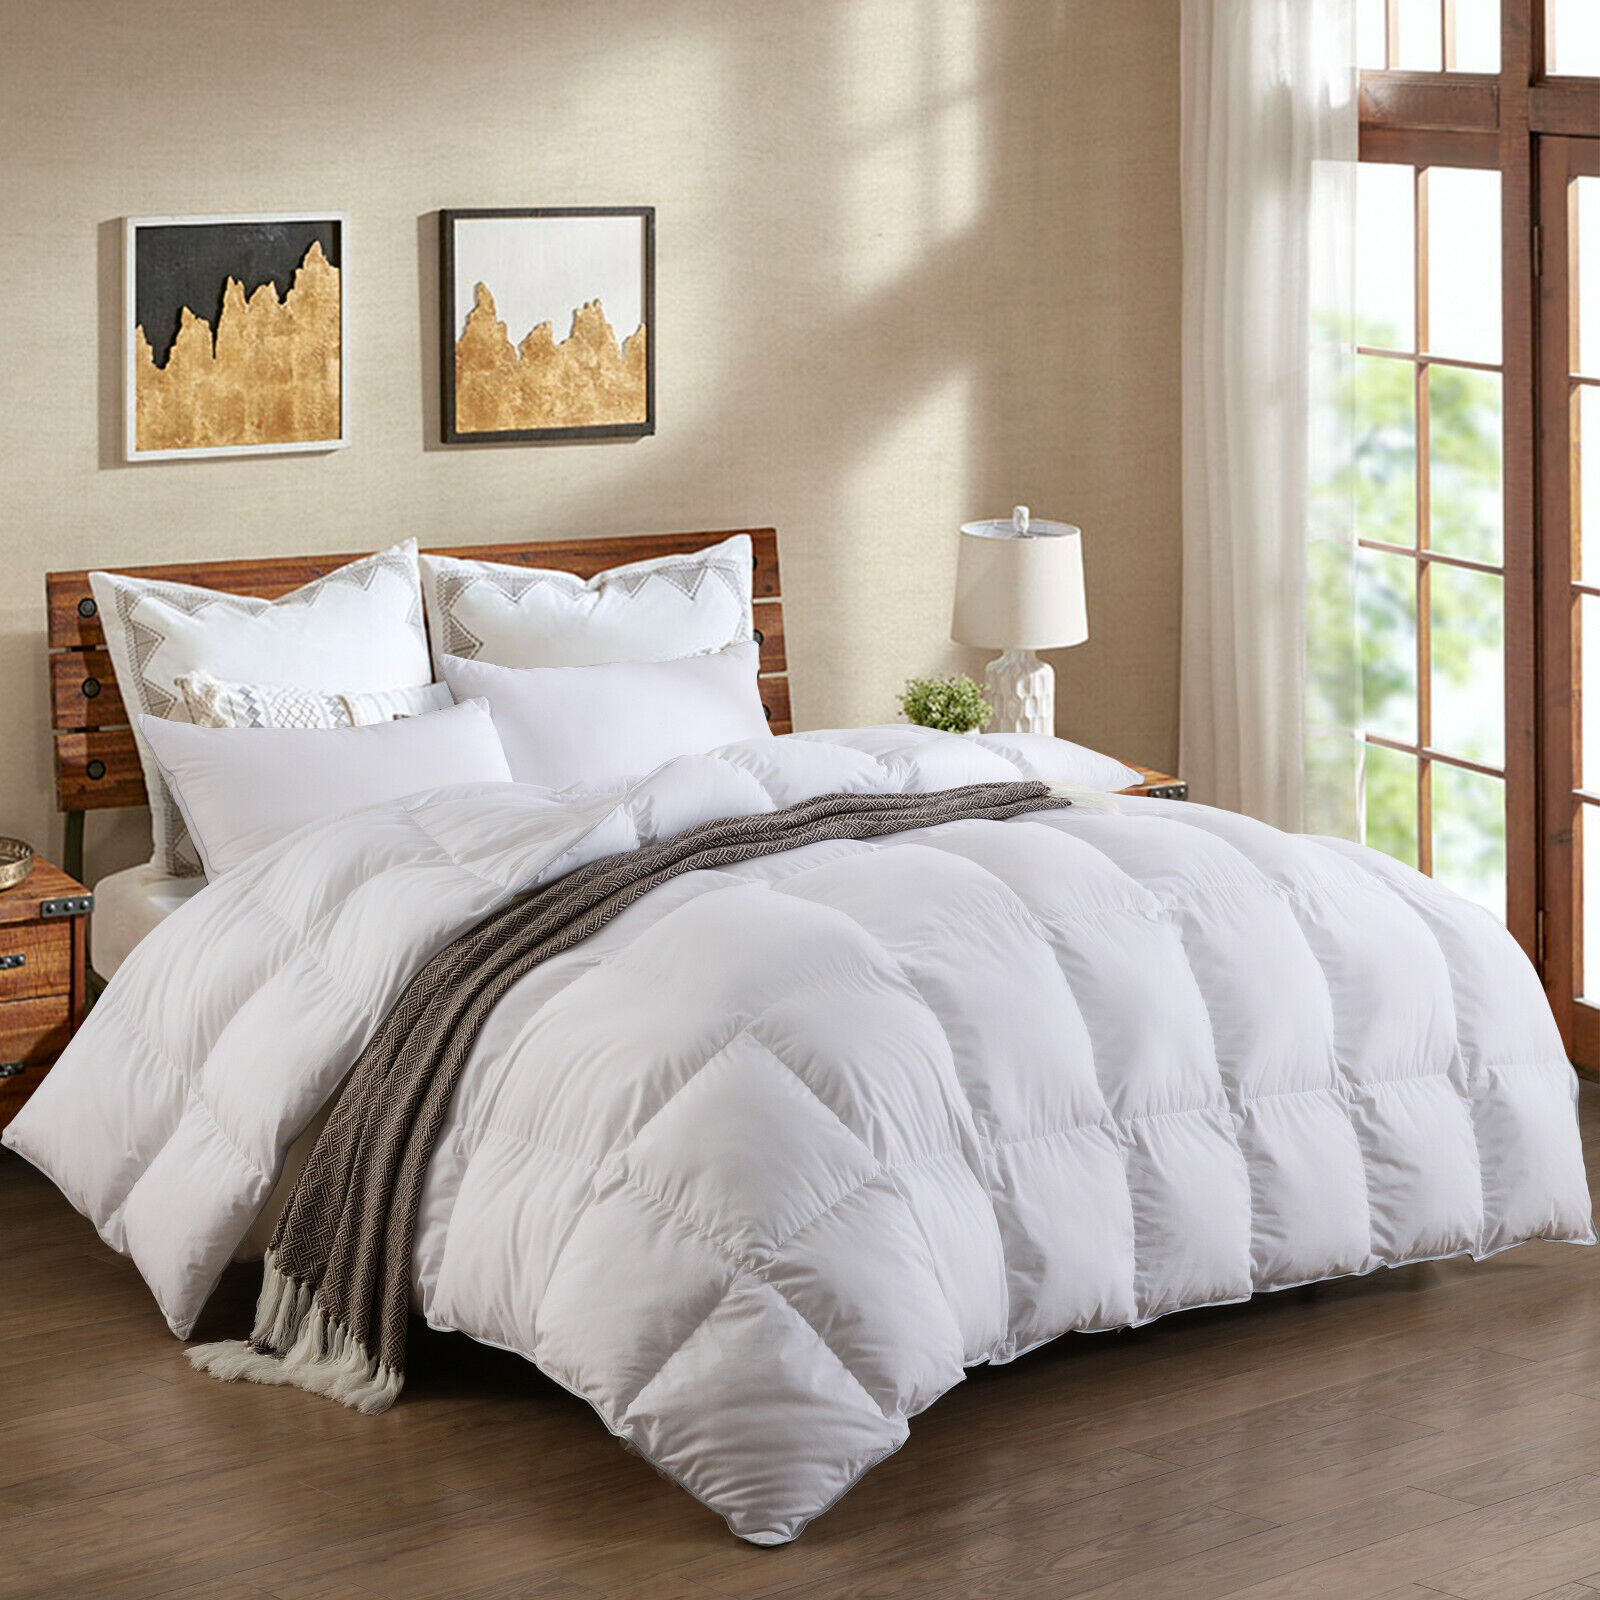 Lightweight Goose Down Comforter